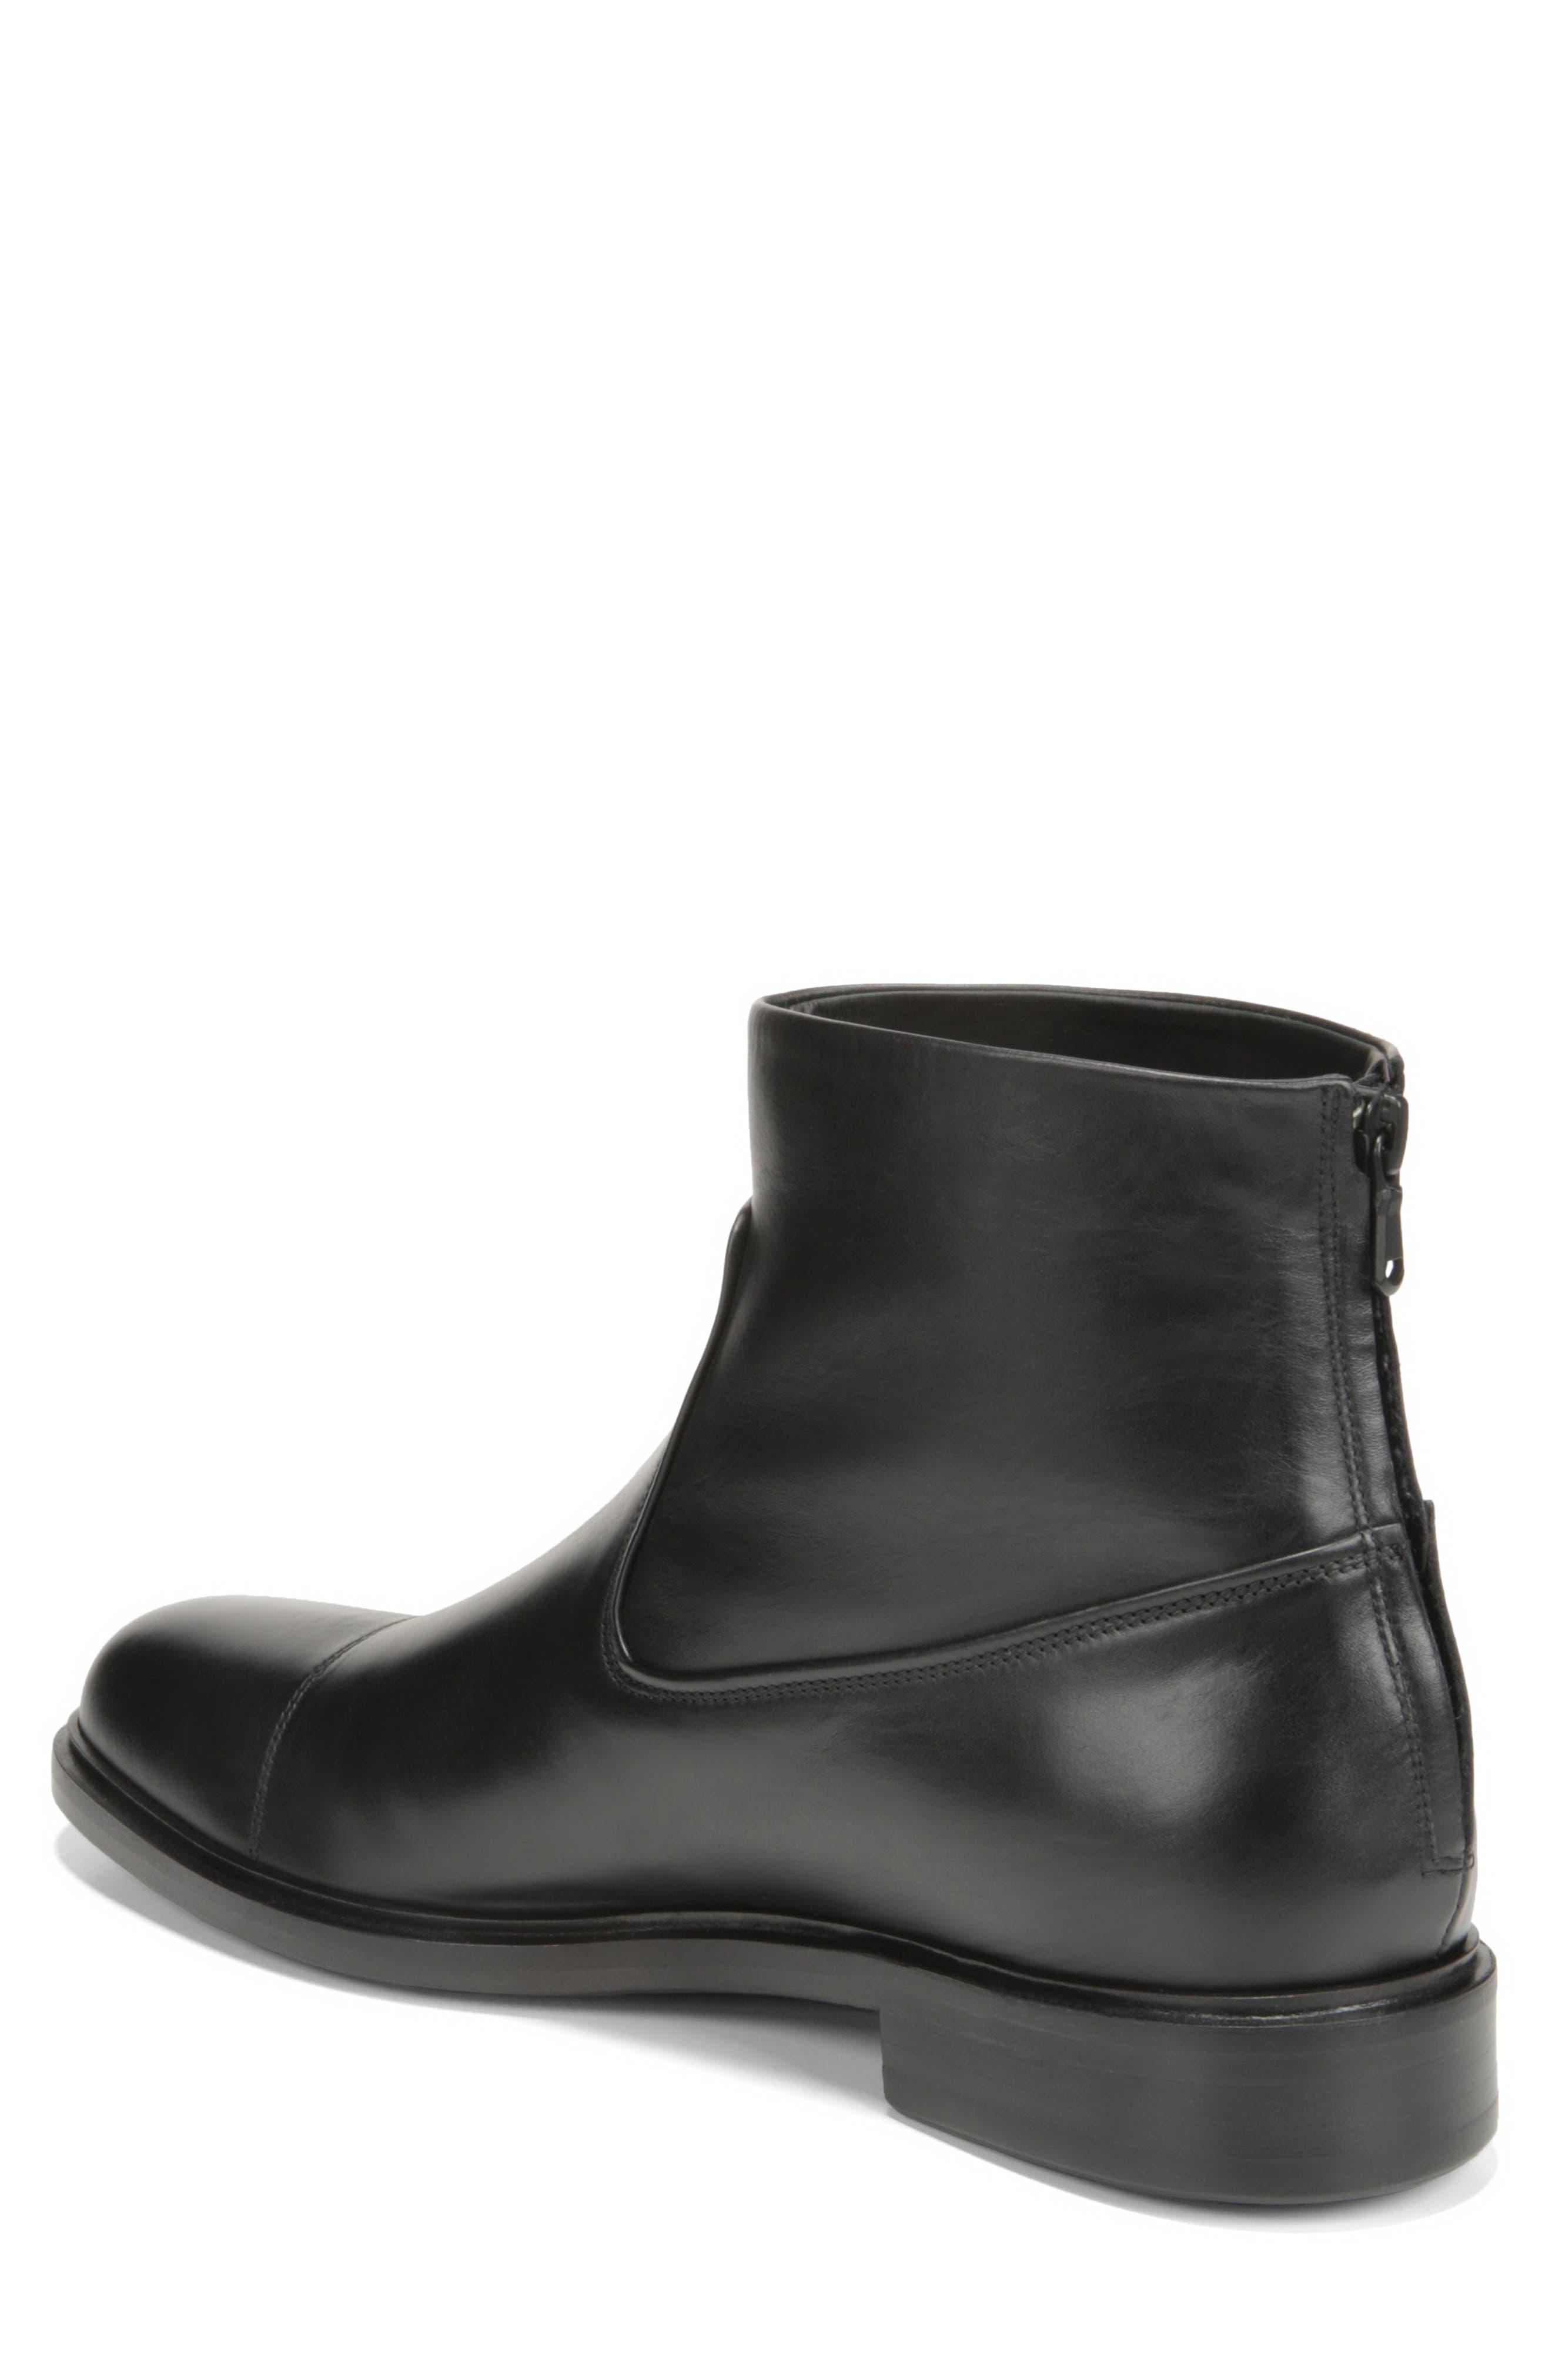 Beckett Zip Boot,                             Alternate thumbnail 2, color,                             BLACK